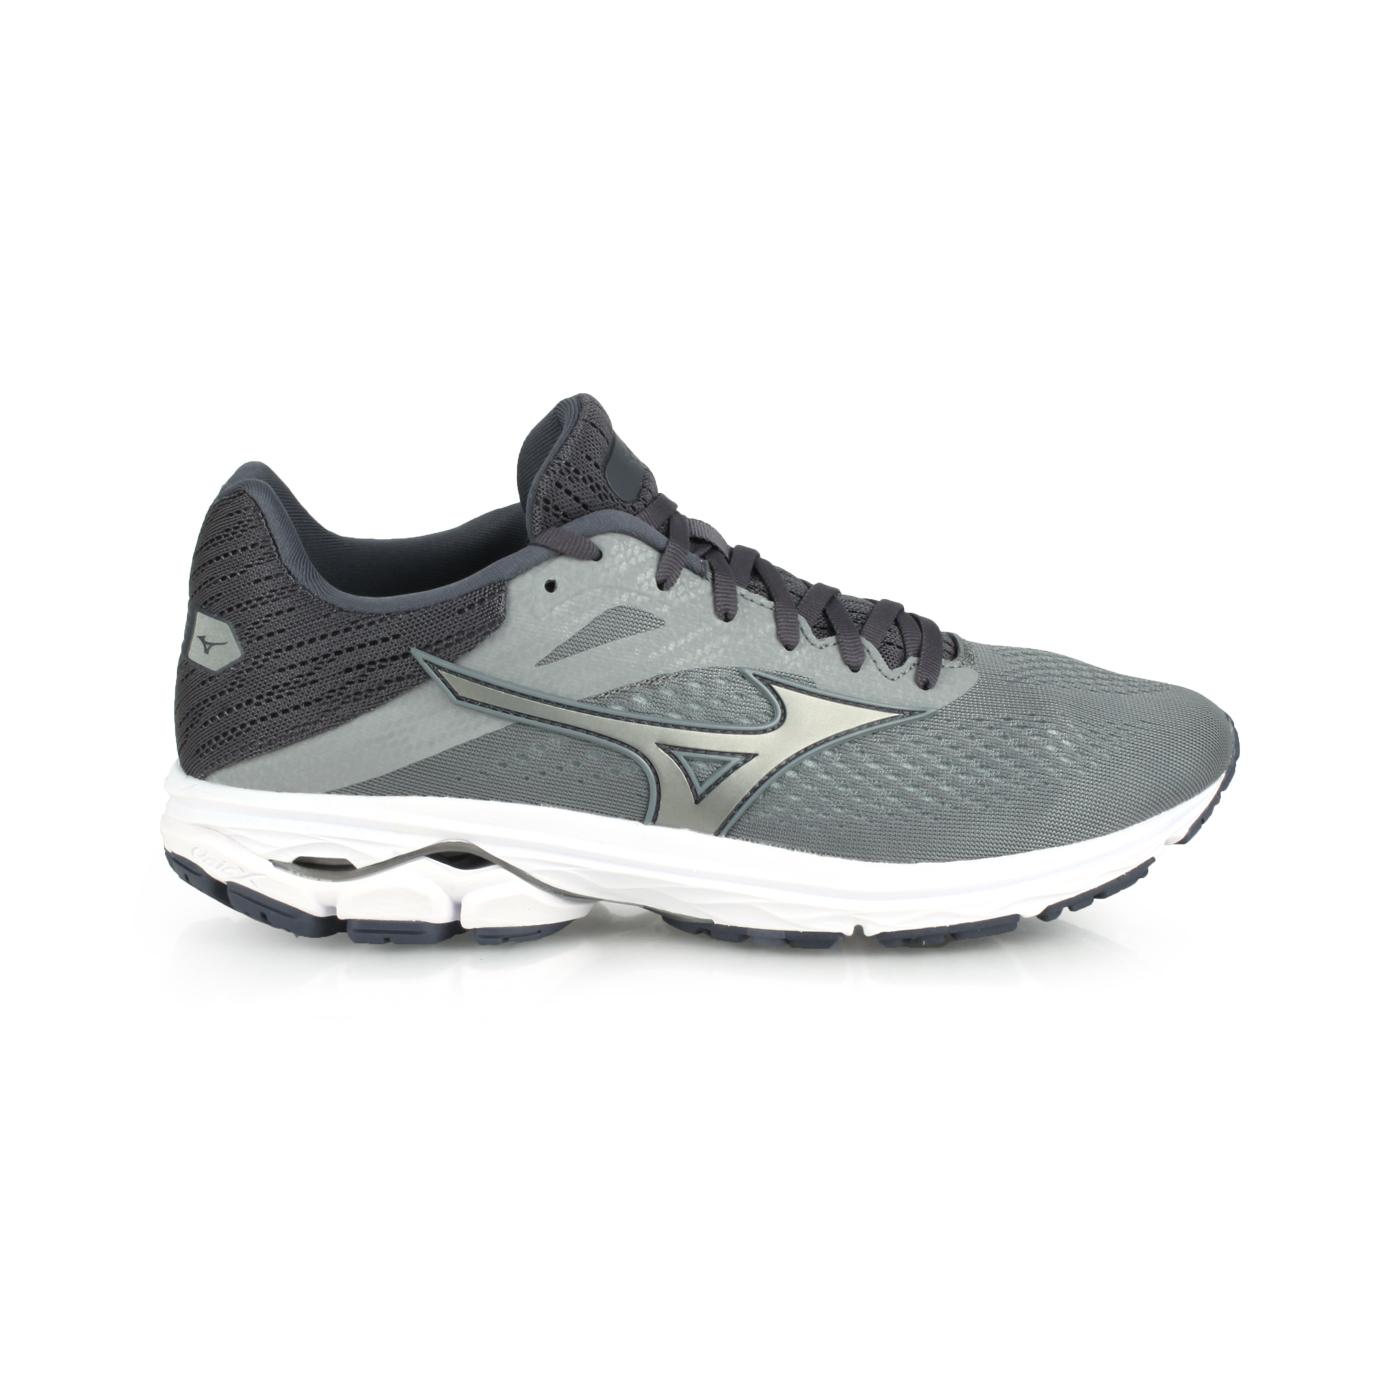 MIZUNO 男款慢跑鞋  @WAVE RIDER 23@J1GC190324 - 灰深灰